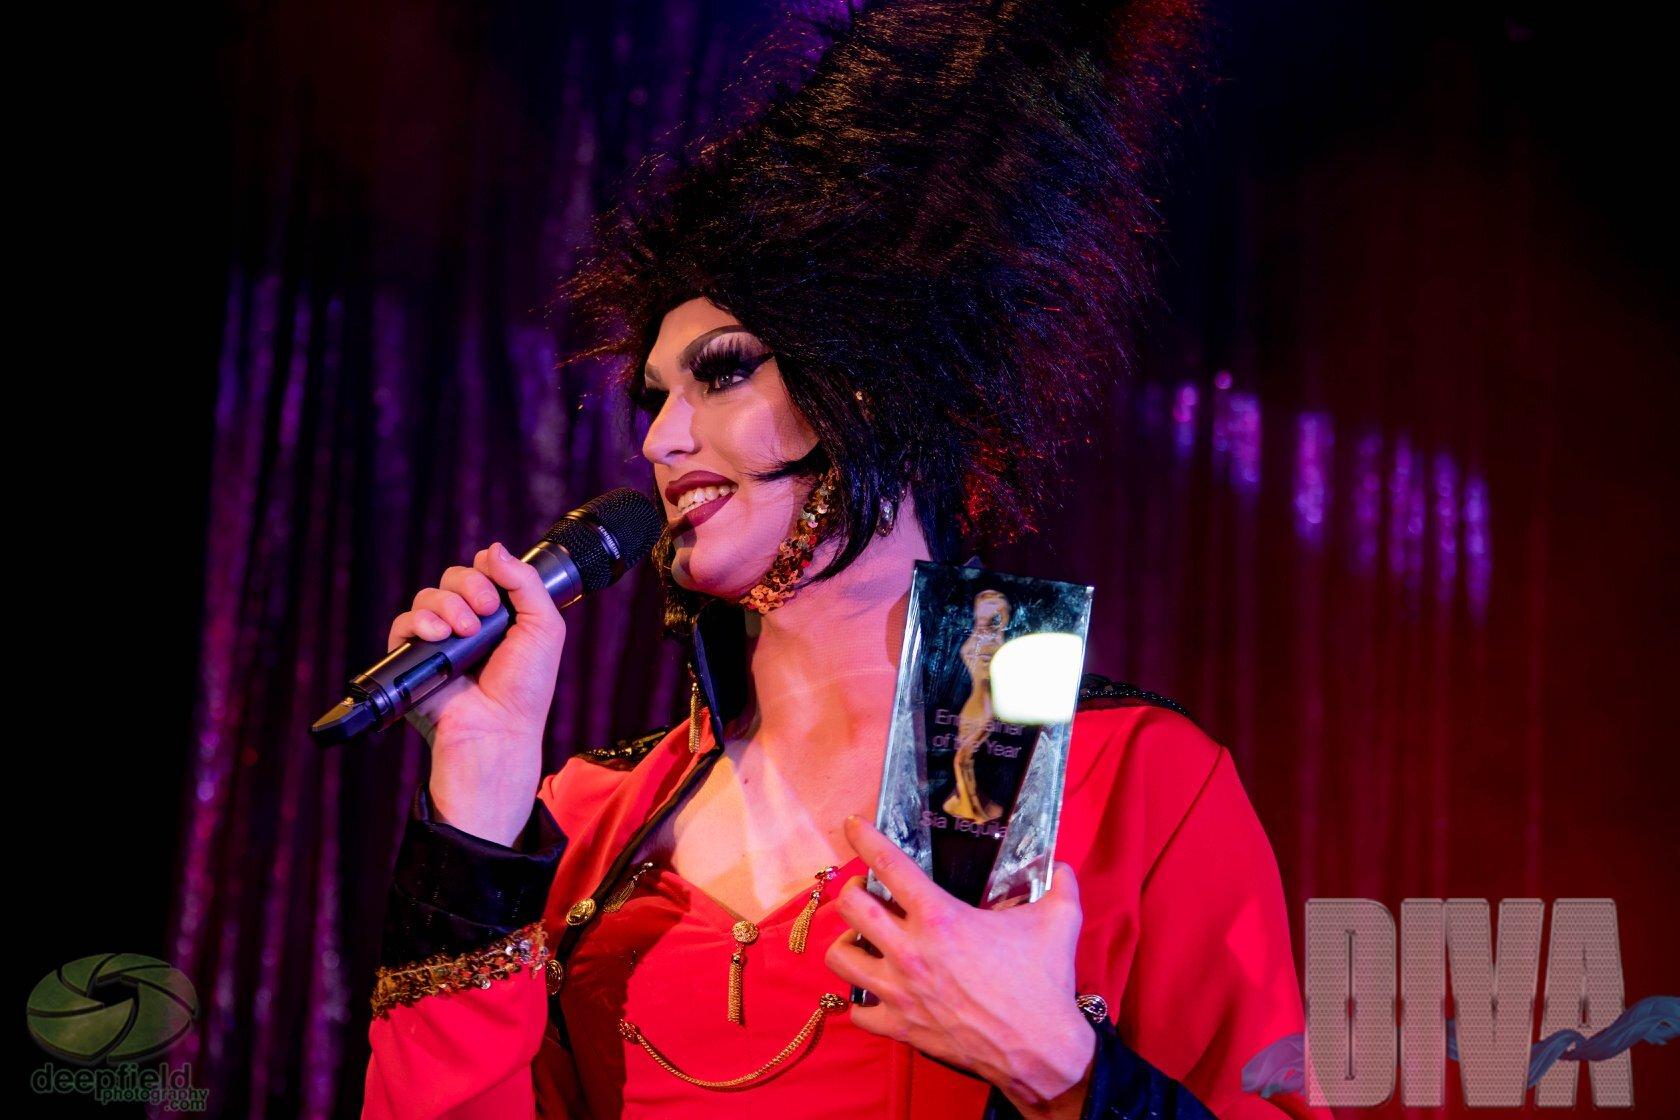 sia-tequila-winner-win-entertainer-of-the-year-diva-awards-sydney-drag-queen-royalty-best-hire-drag-race-australia-5.jpg